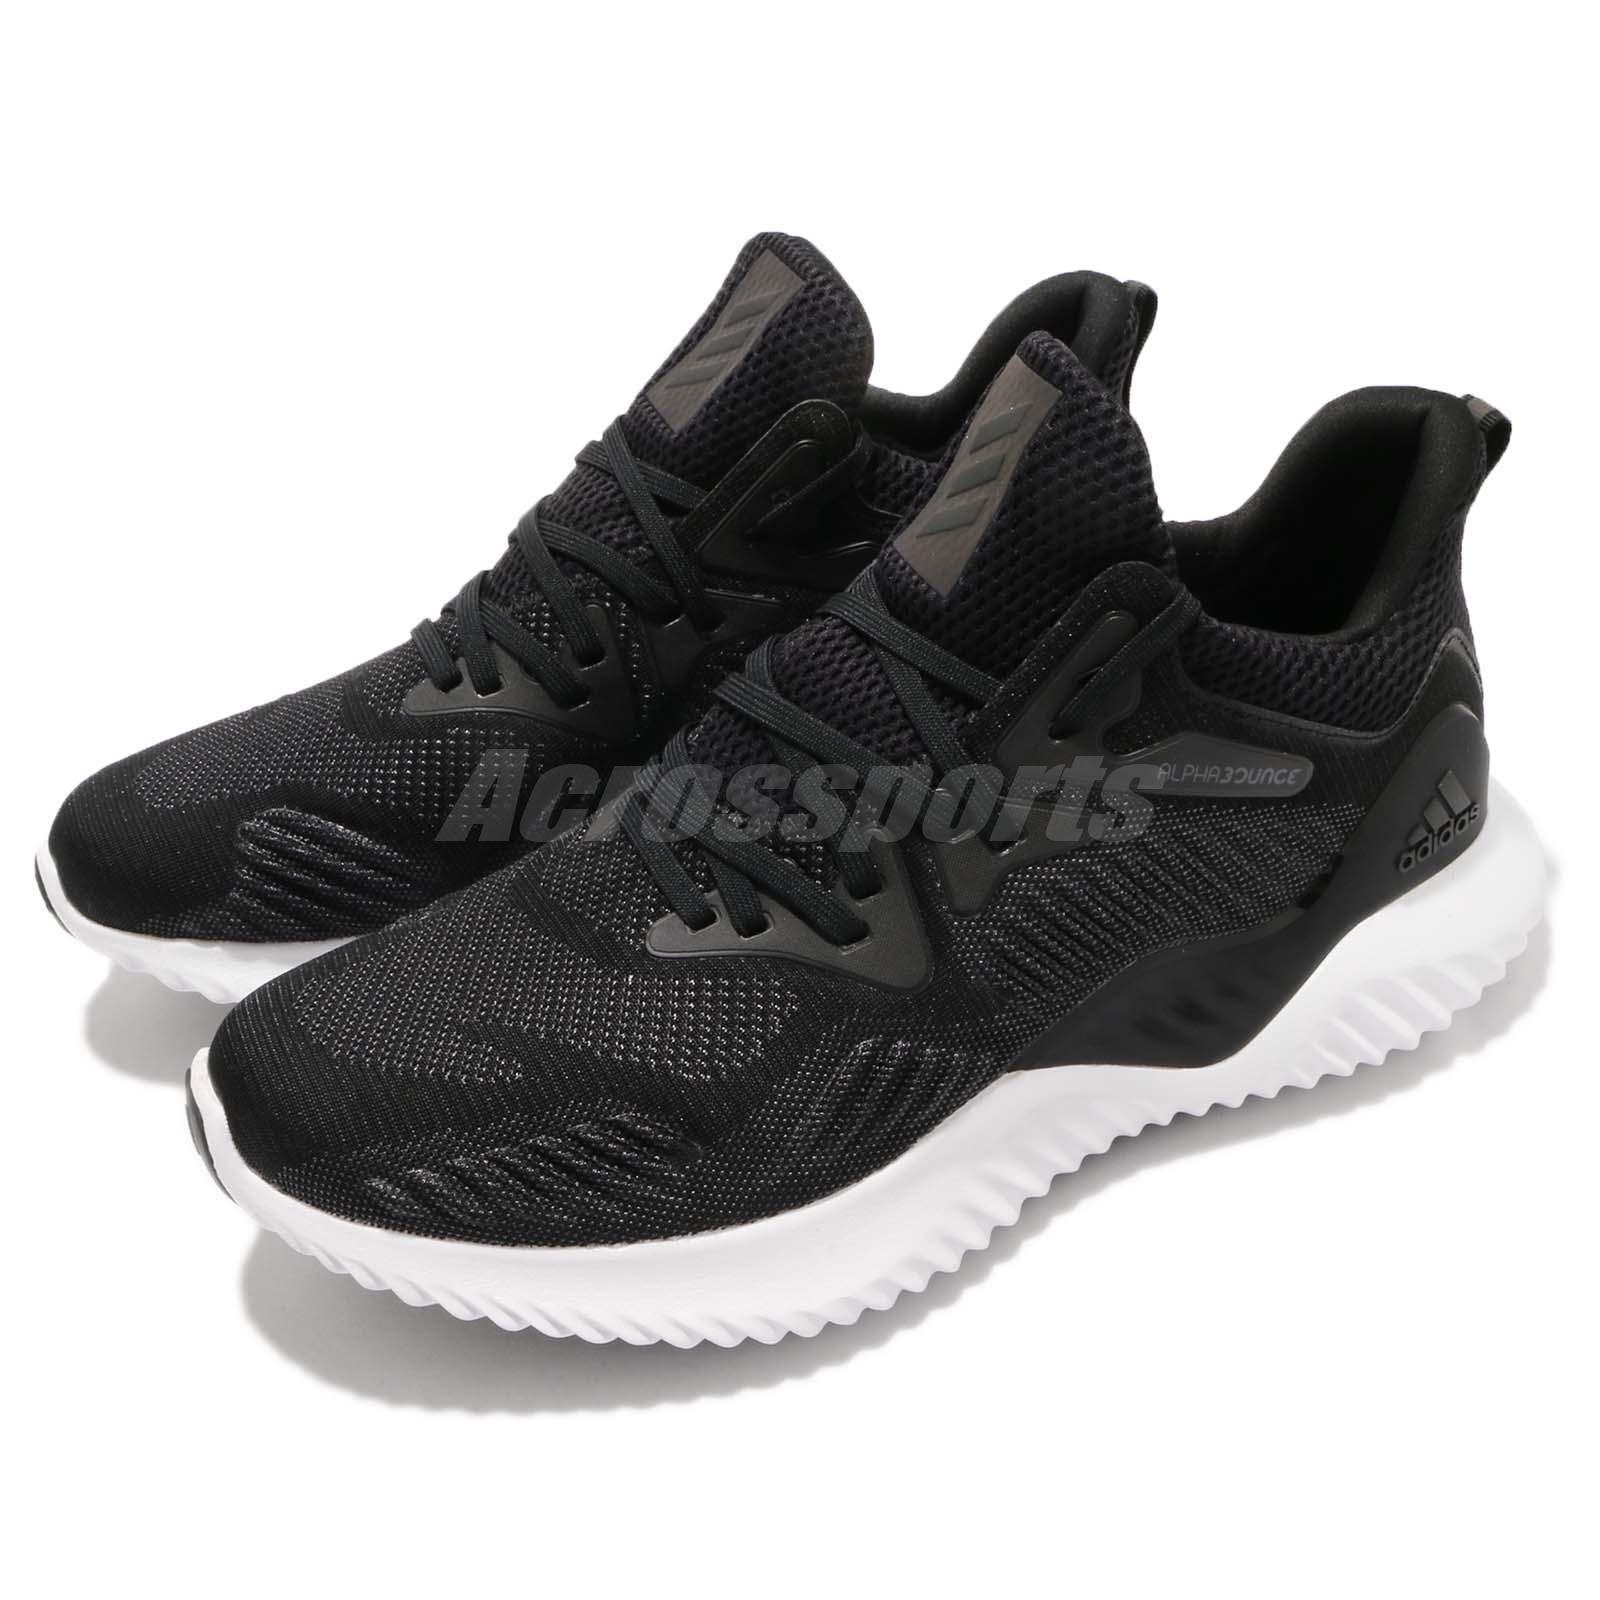 Adidas Alphabounce Beyond rebote Negro Negro Negro blancoo Hombres Correr M Zapatos Tenis AC8273 bfd82e